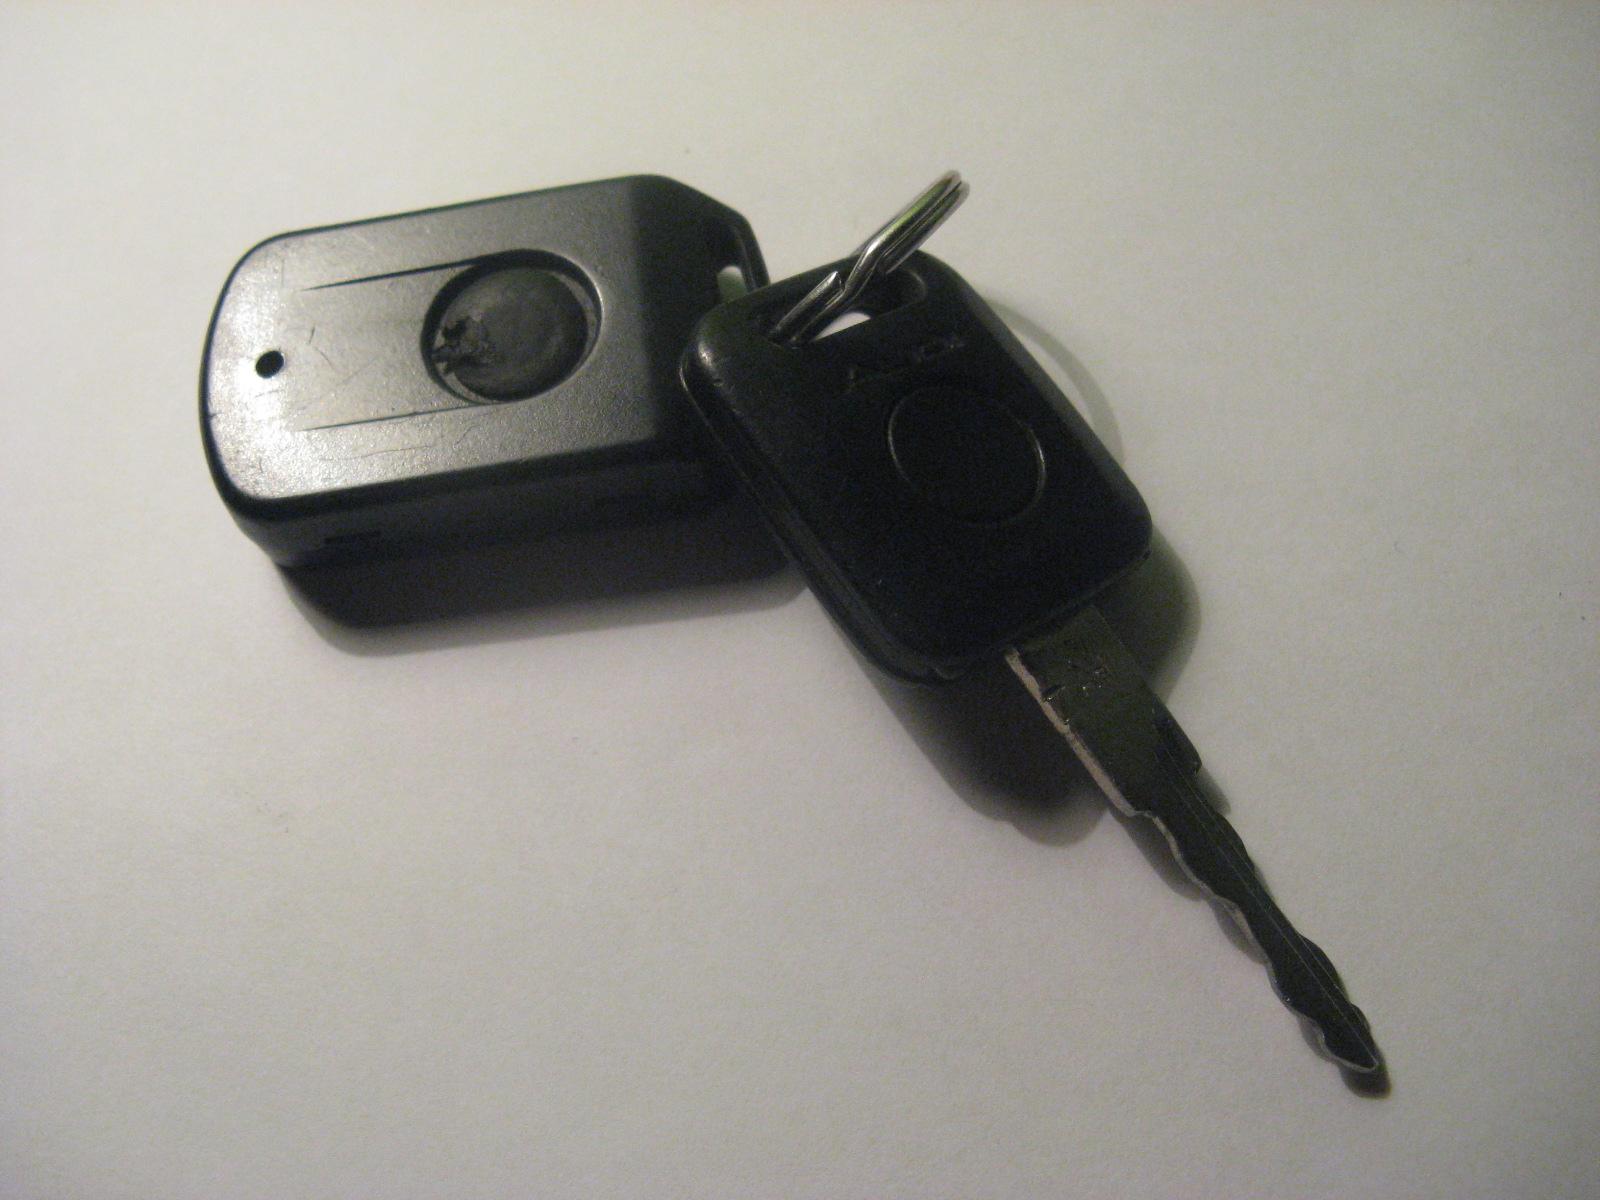 Audi A4 - Centralny, immobilizer nie reaguj� na sygna� z pilota.